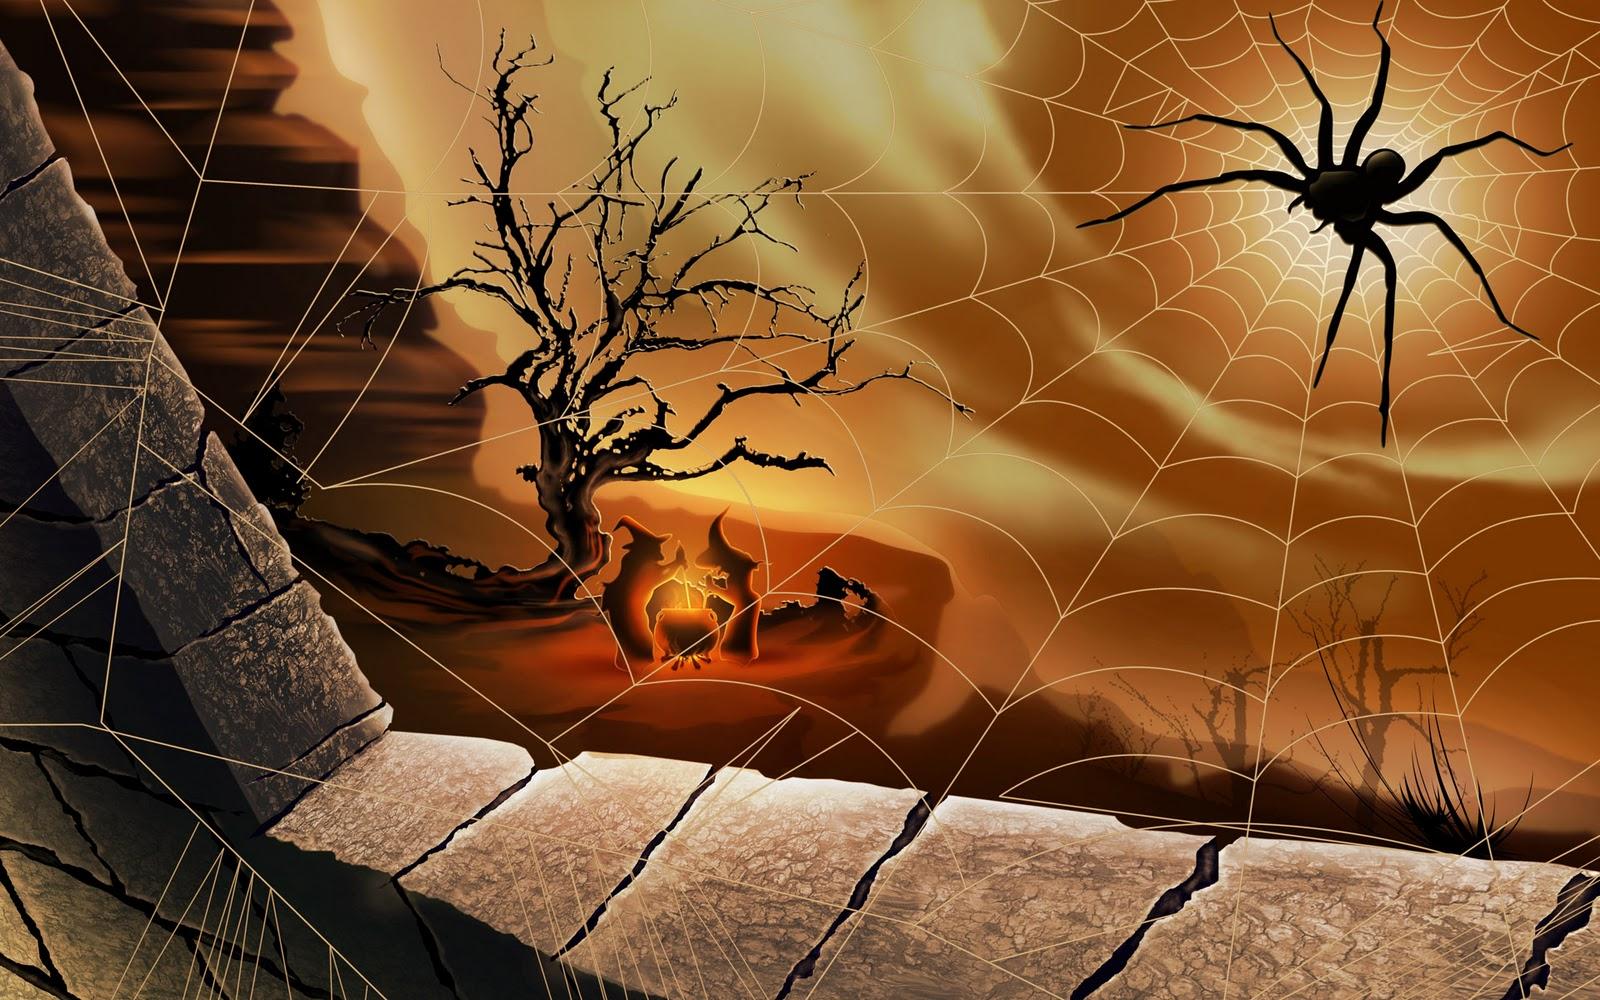 High definition photo and wallpapers halloween desktop - Scary halloween wallpaper ...